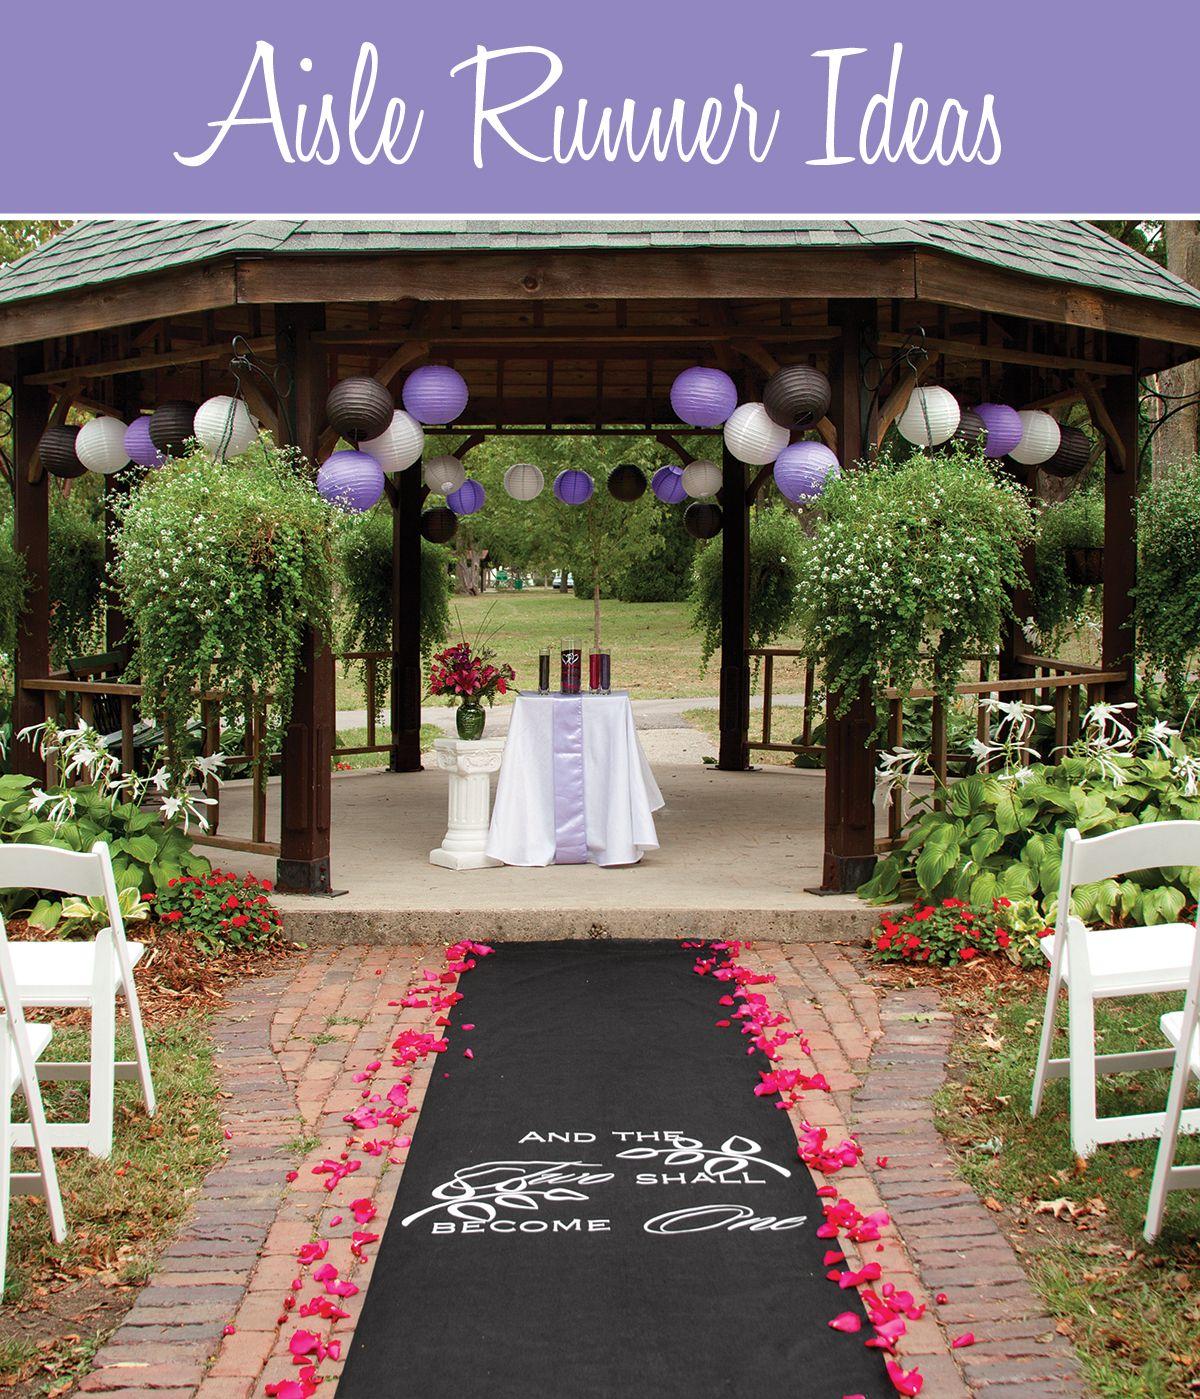 Wedding Aisle Runner Ideas